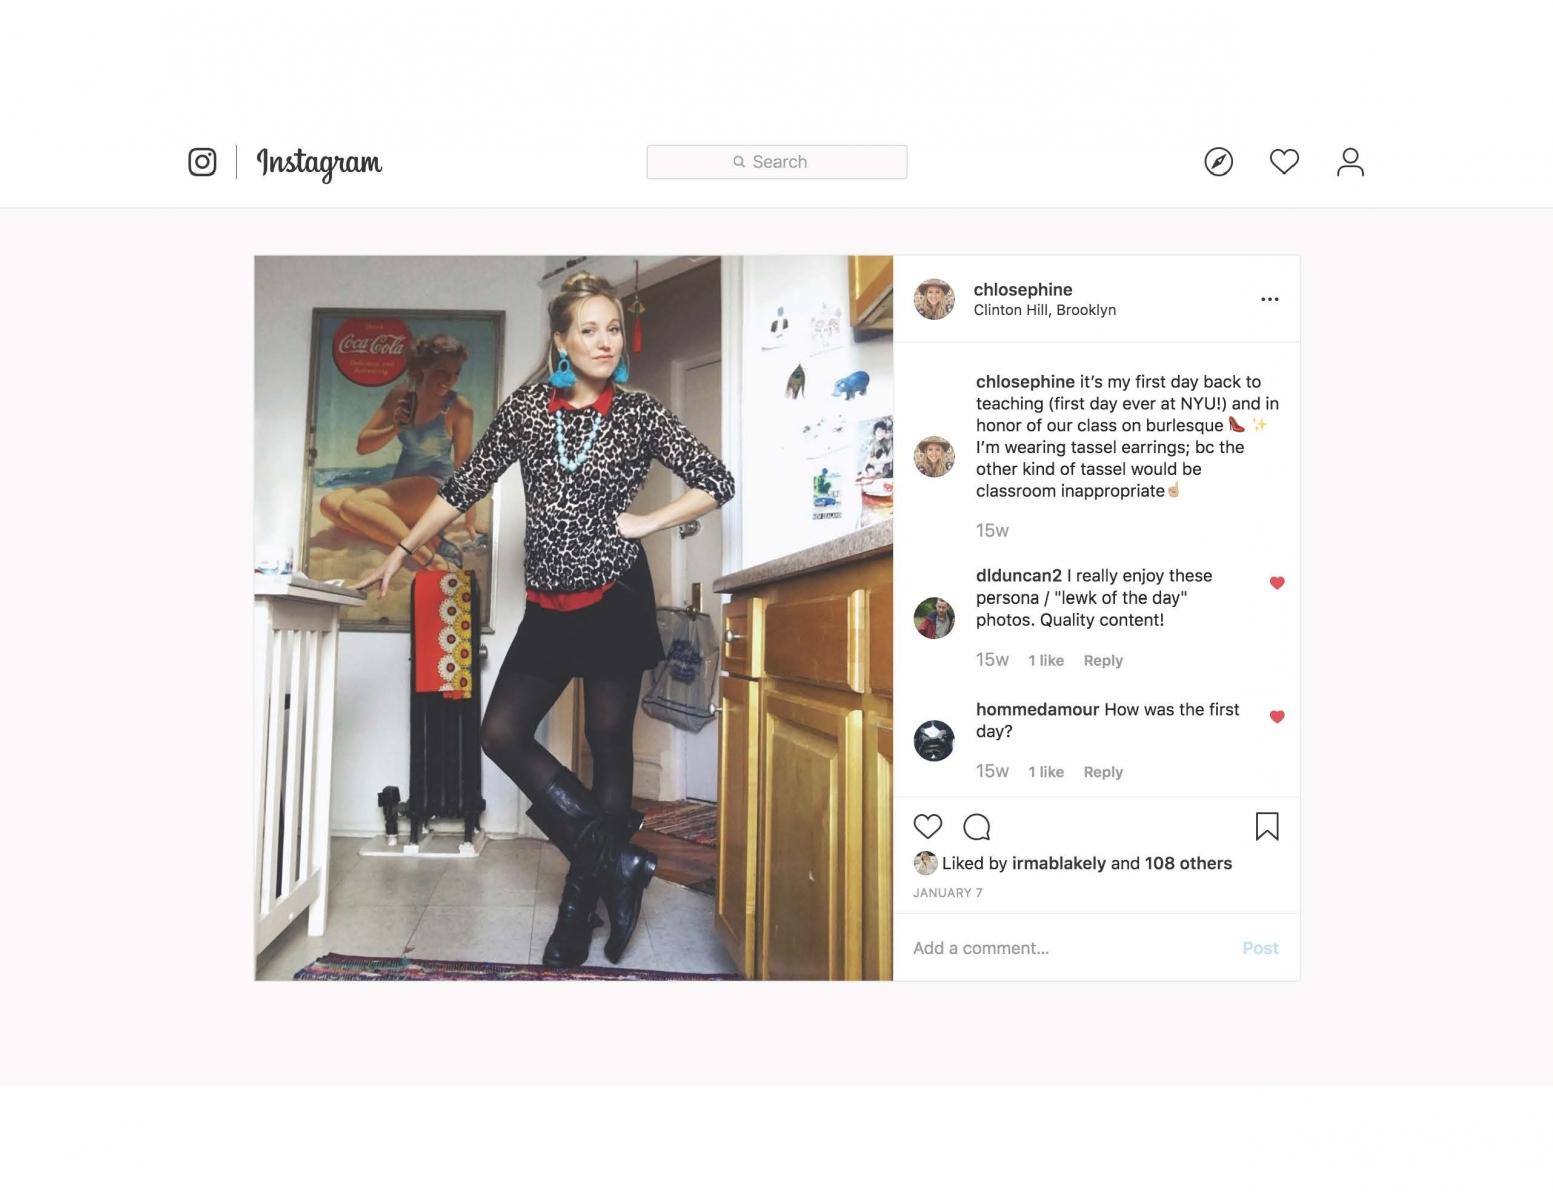 EDMONSON-Instagram-Pedagogy1_Page_01